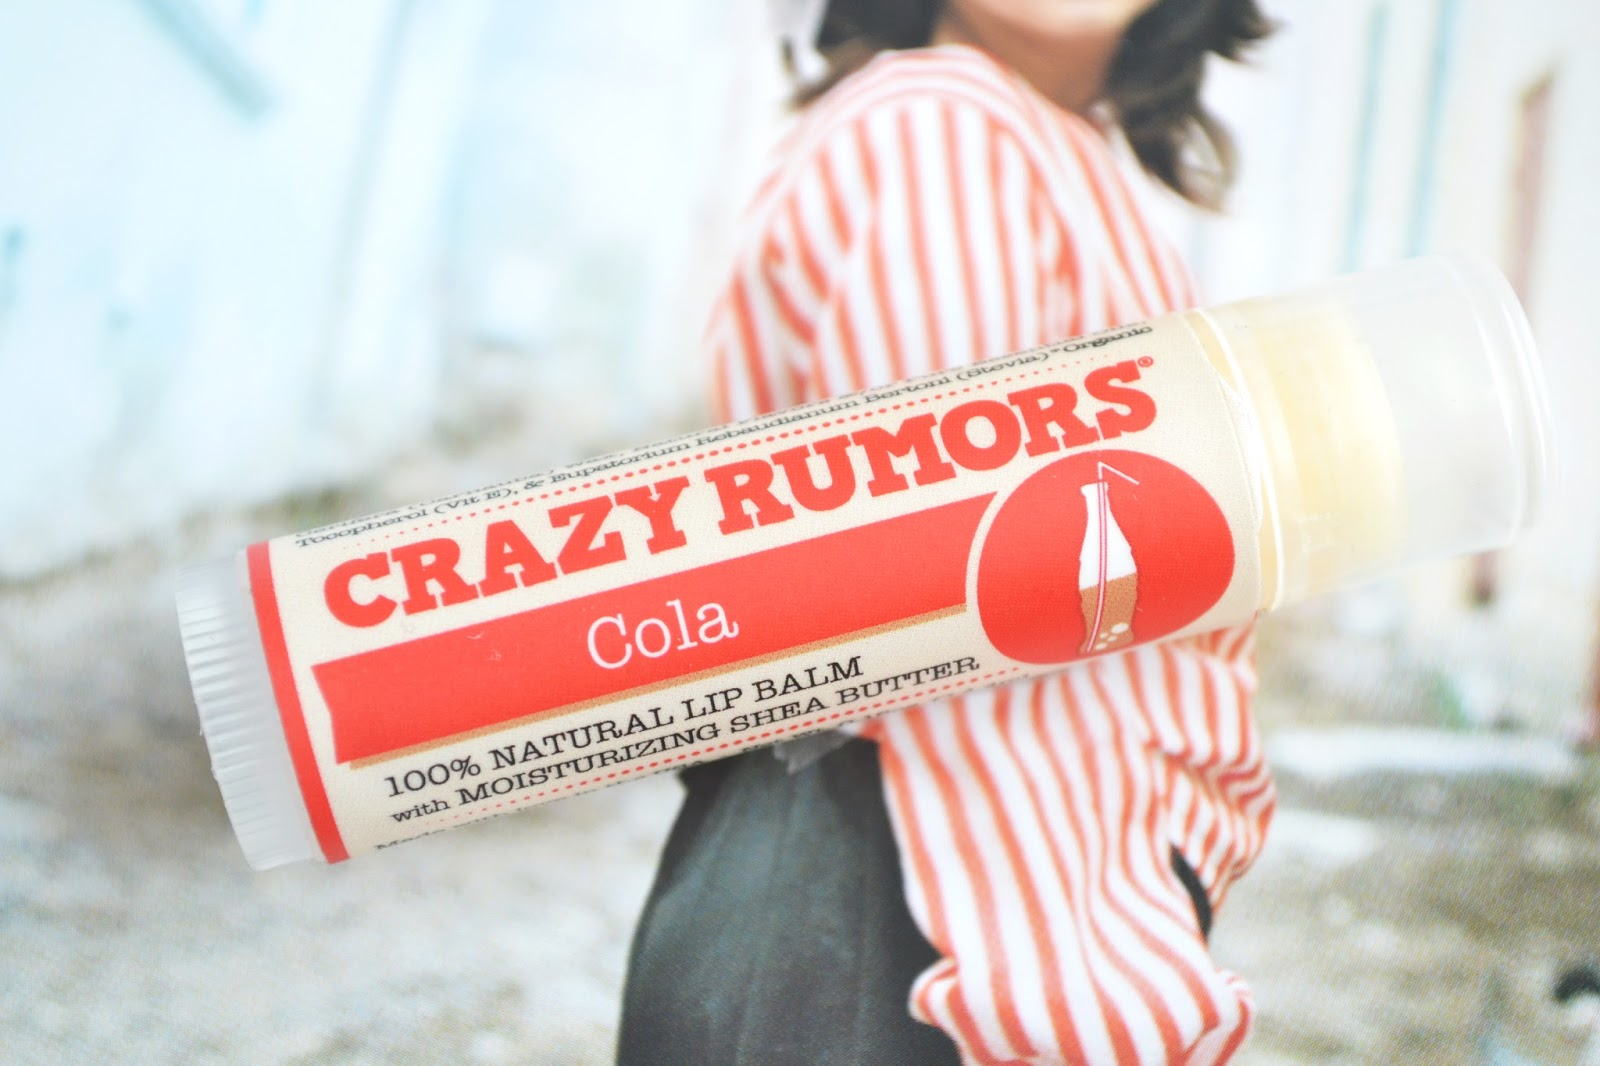 Crazy Rumors COLA lip balm review, crazy rumours lip balm UK